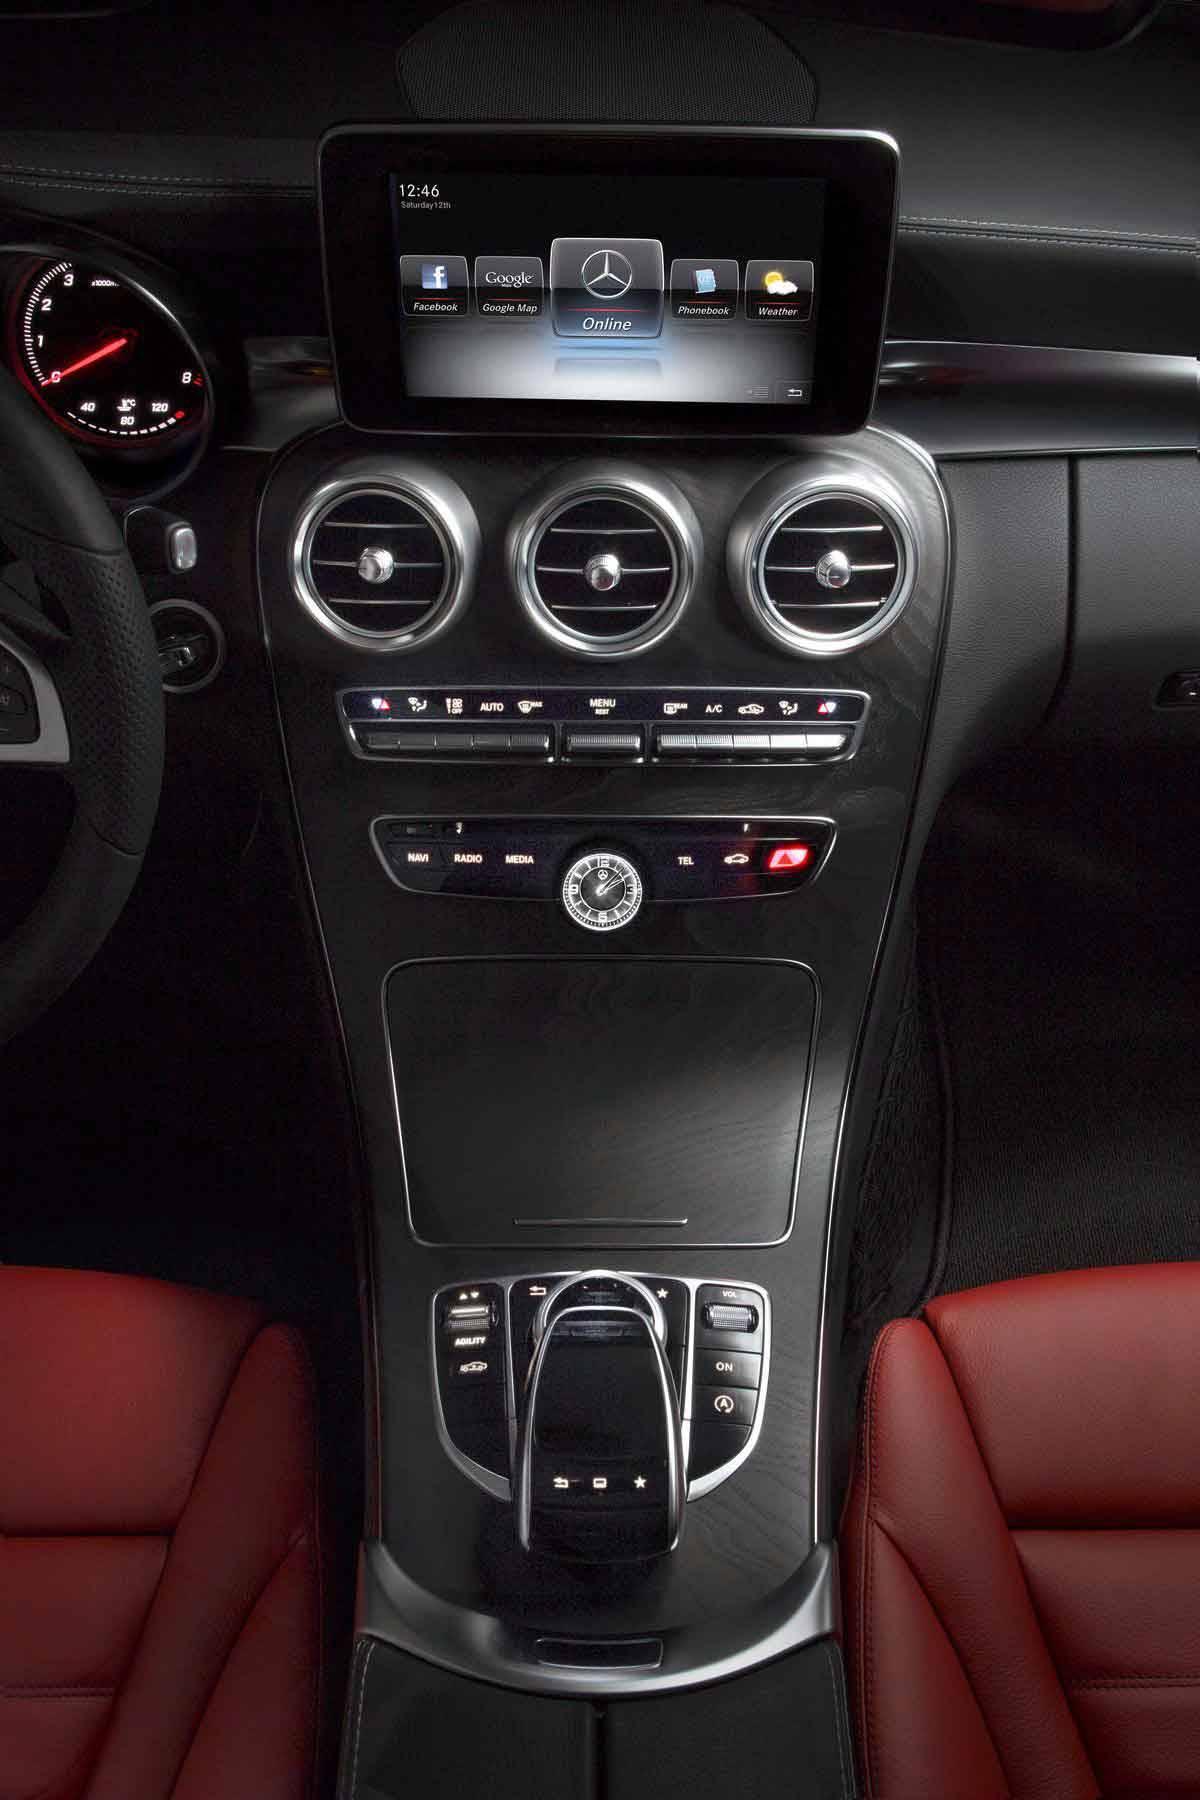 Mercedes C-Klasse Mittelkonsole